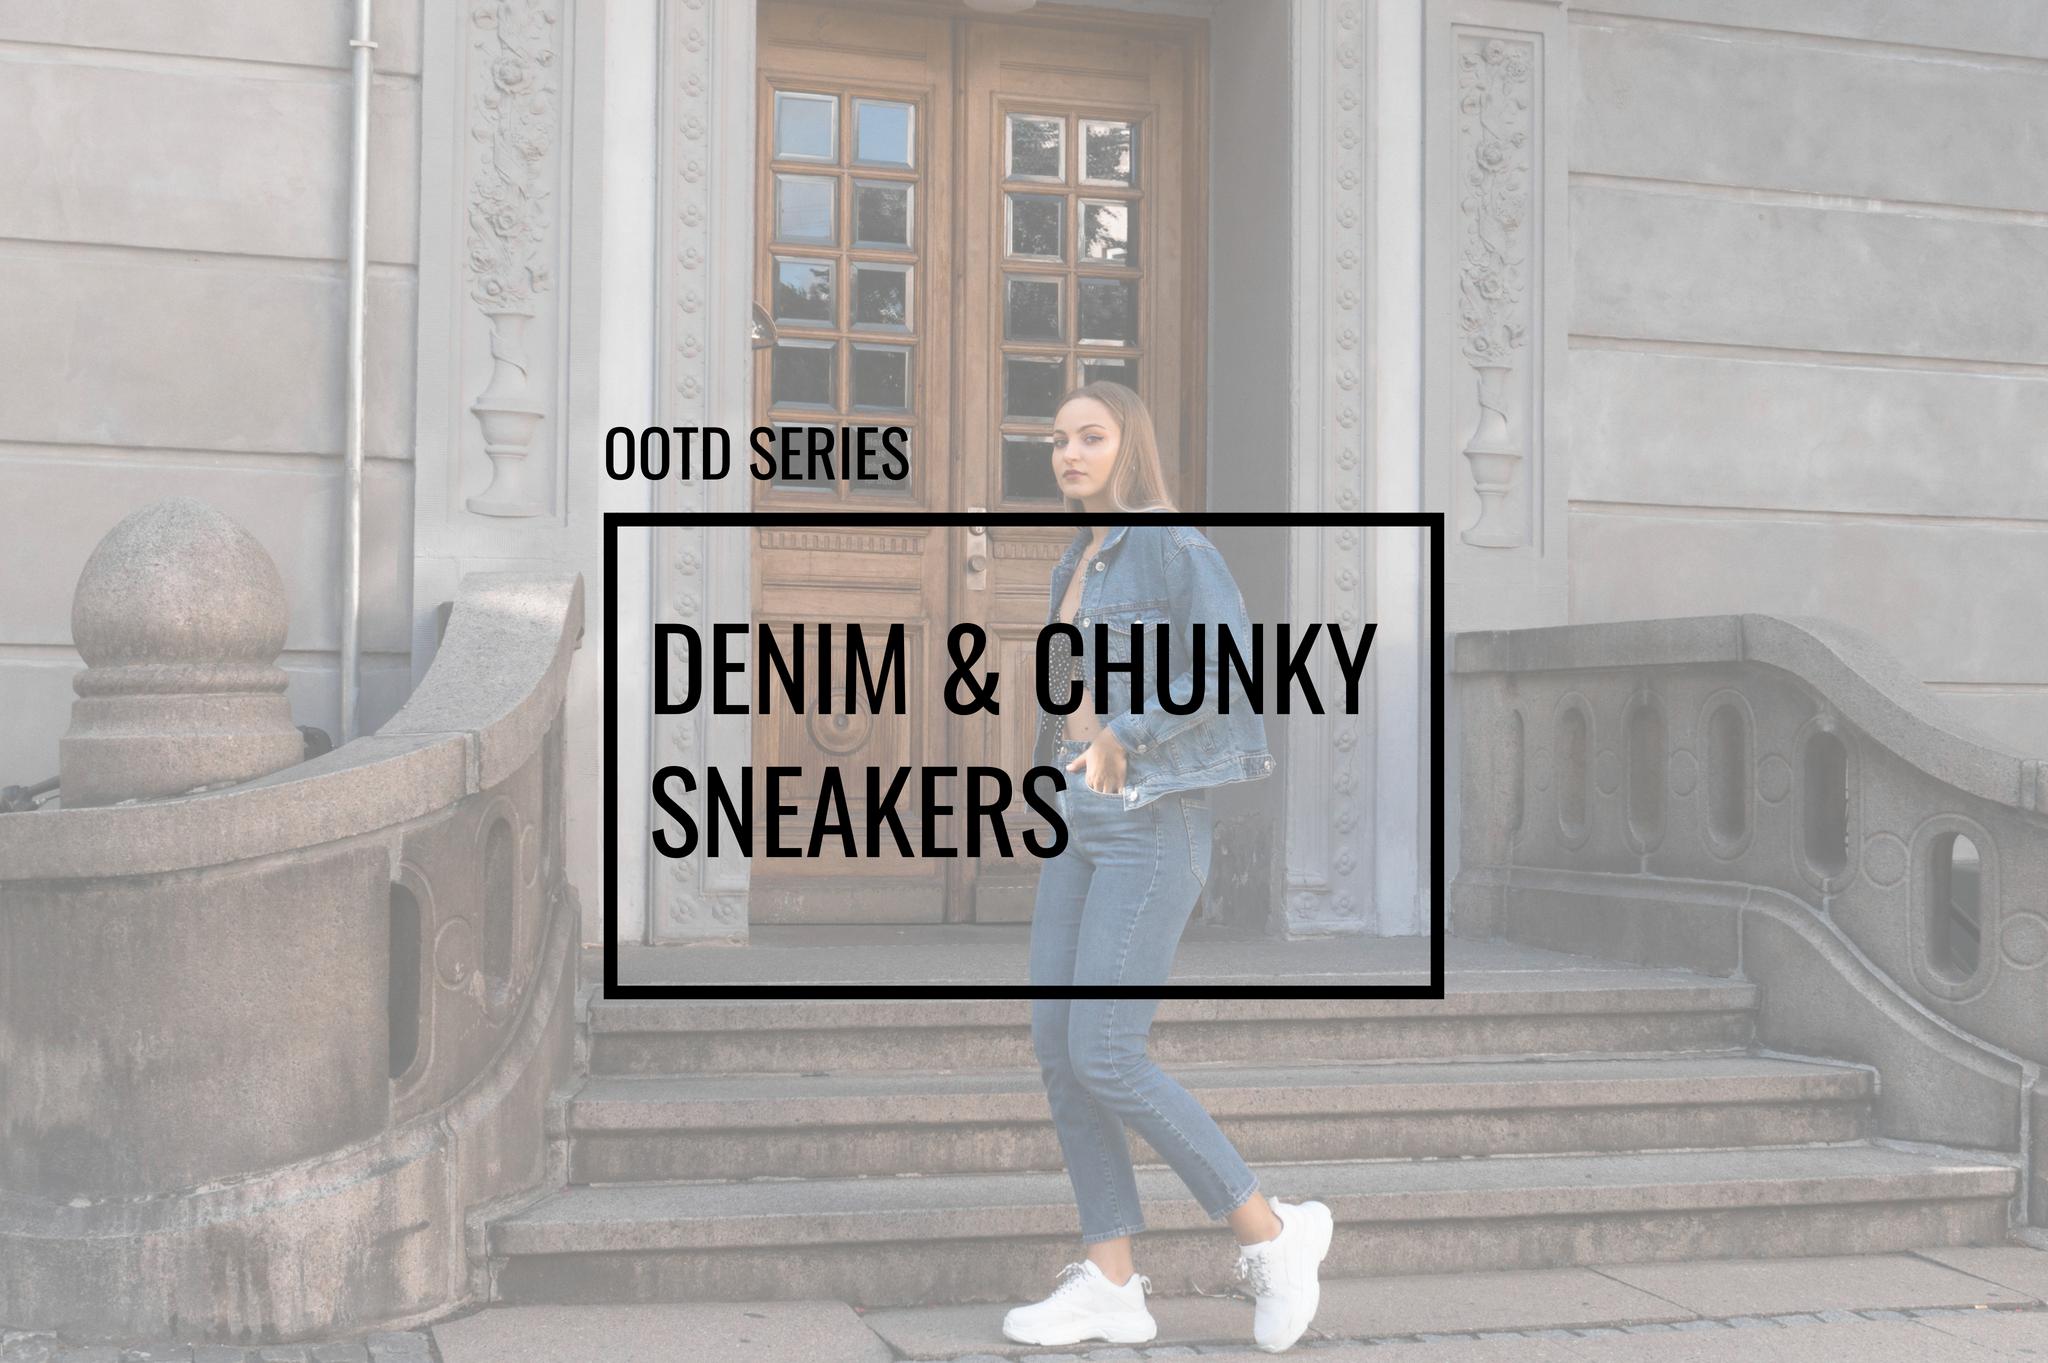 chunky sneakers nelly review big sneakers scandinavian style balenciaga like sneakers denim on denim all denim